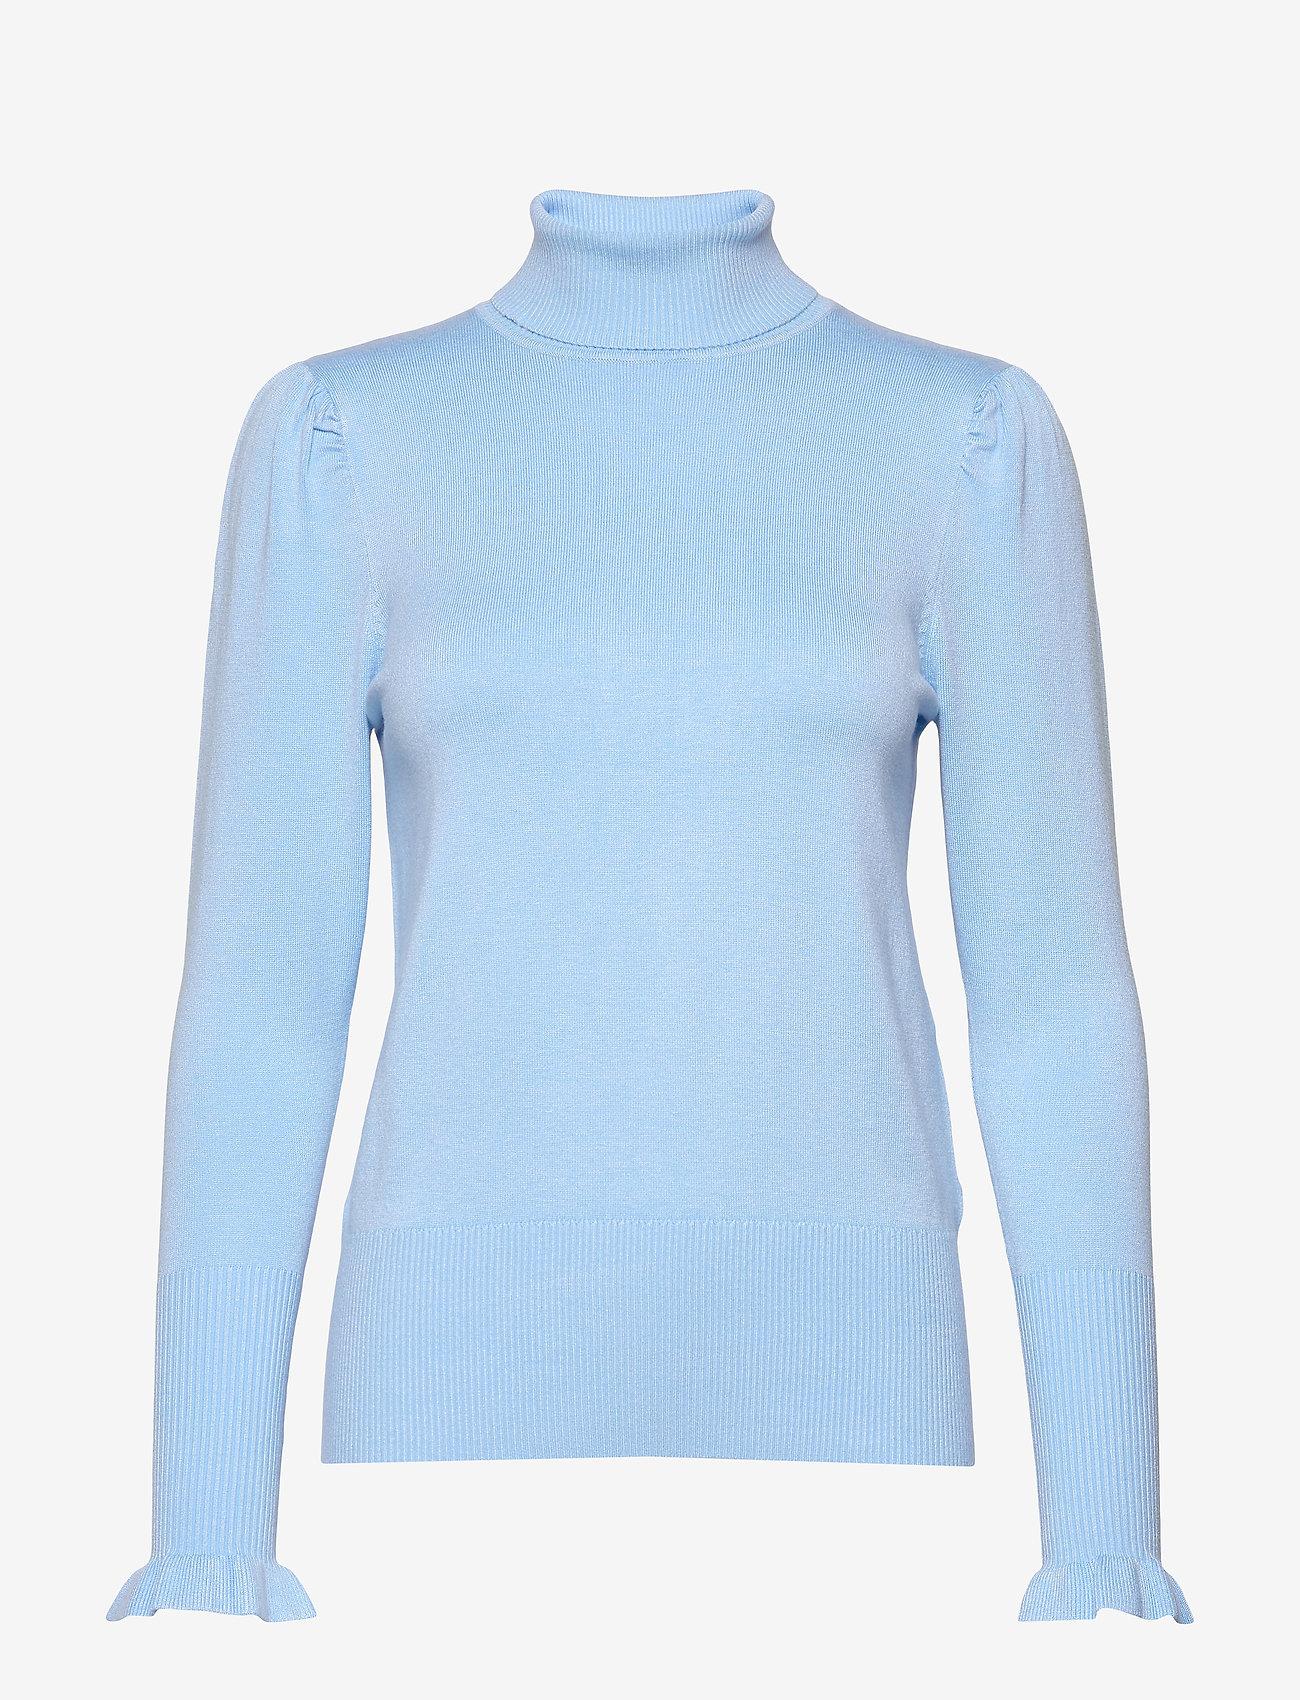 Soyaconcept - SC-DOLLIE - turtlenecks - cristal blue - 0